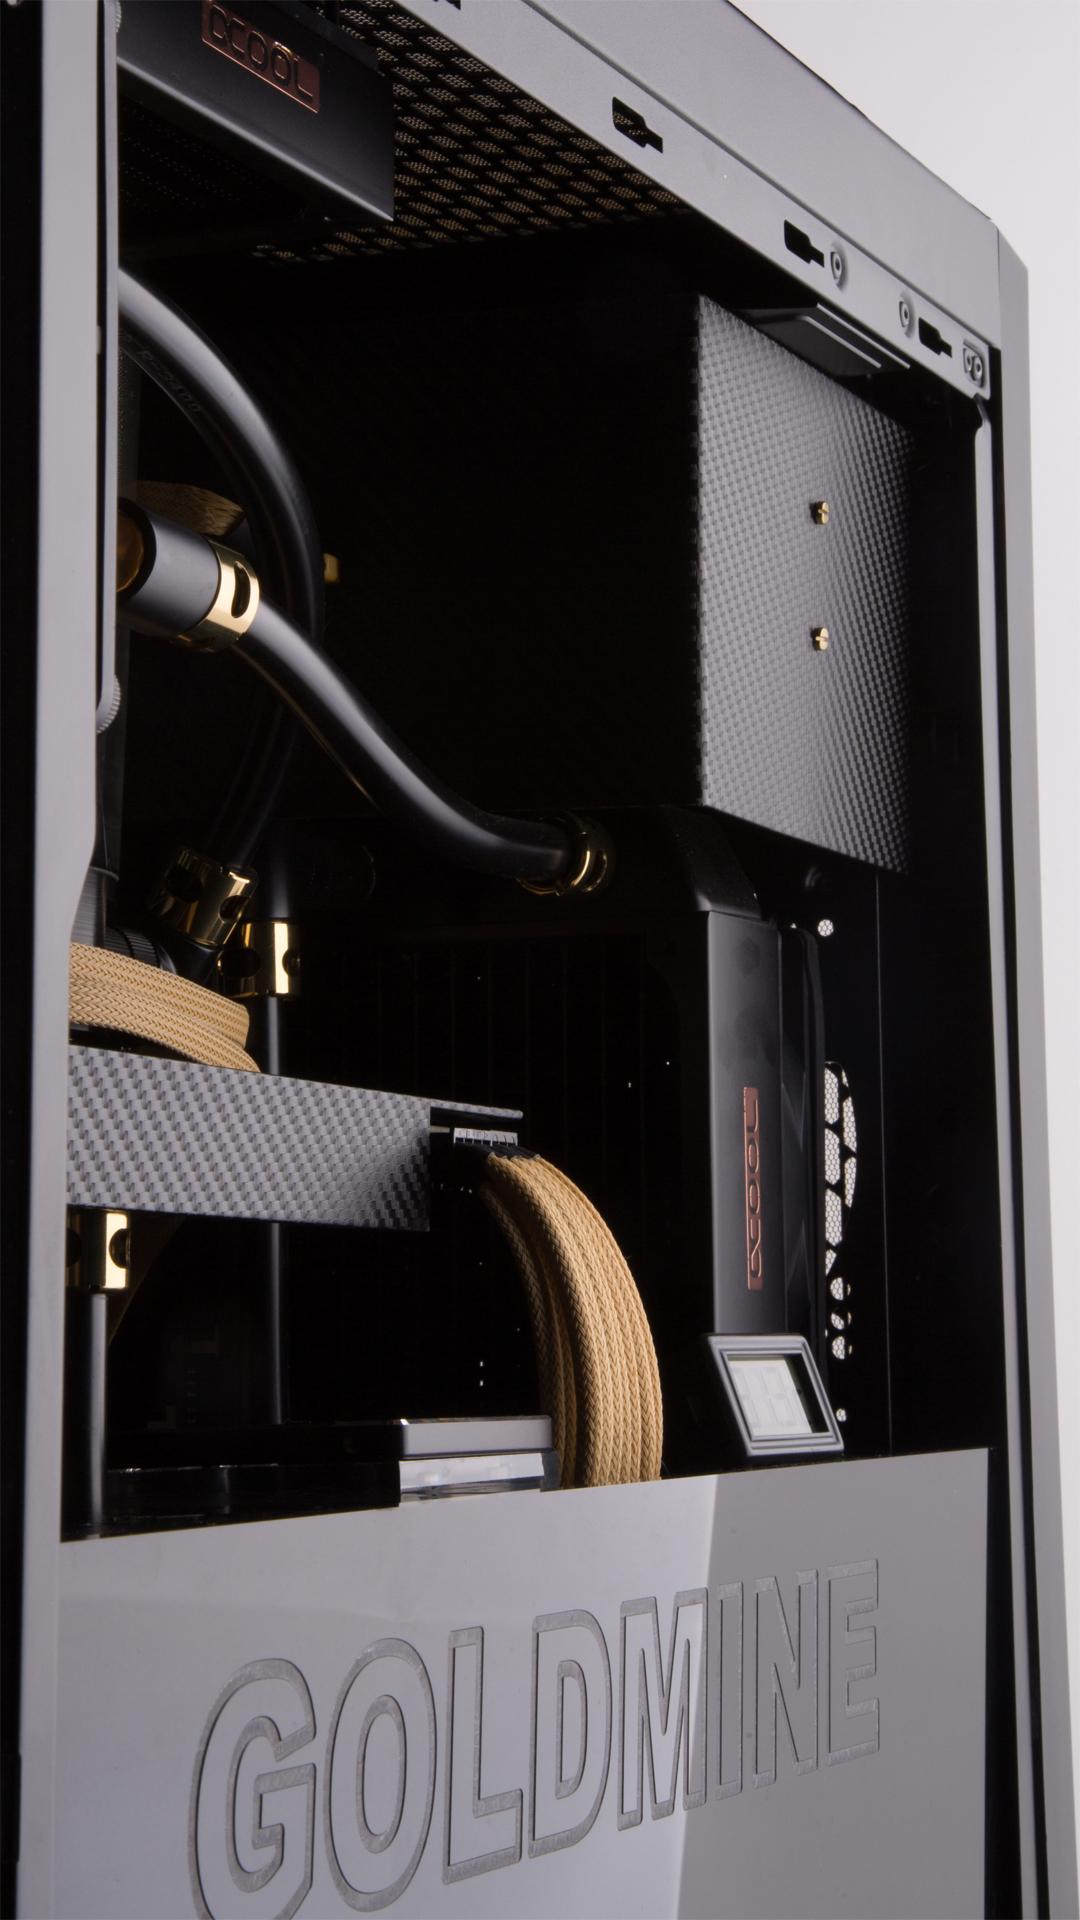 Goldmine V2 Casemod Wasserkuehlung PC